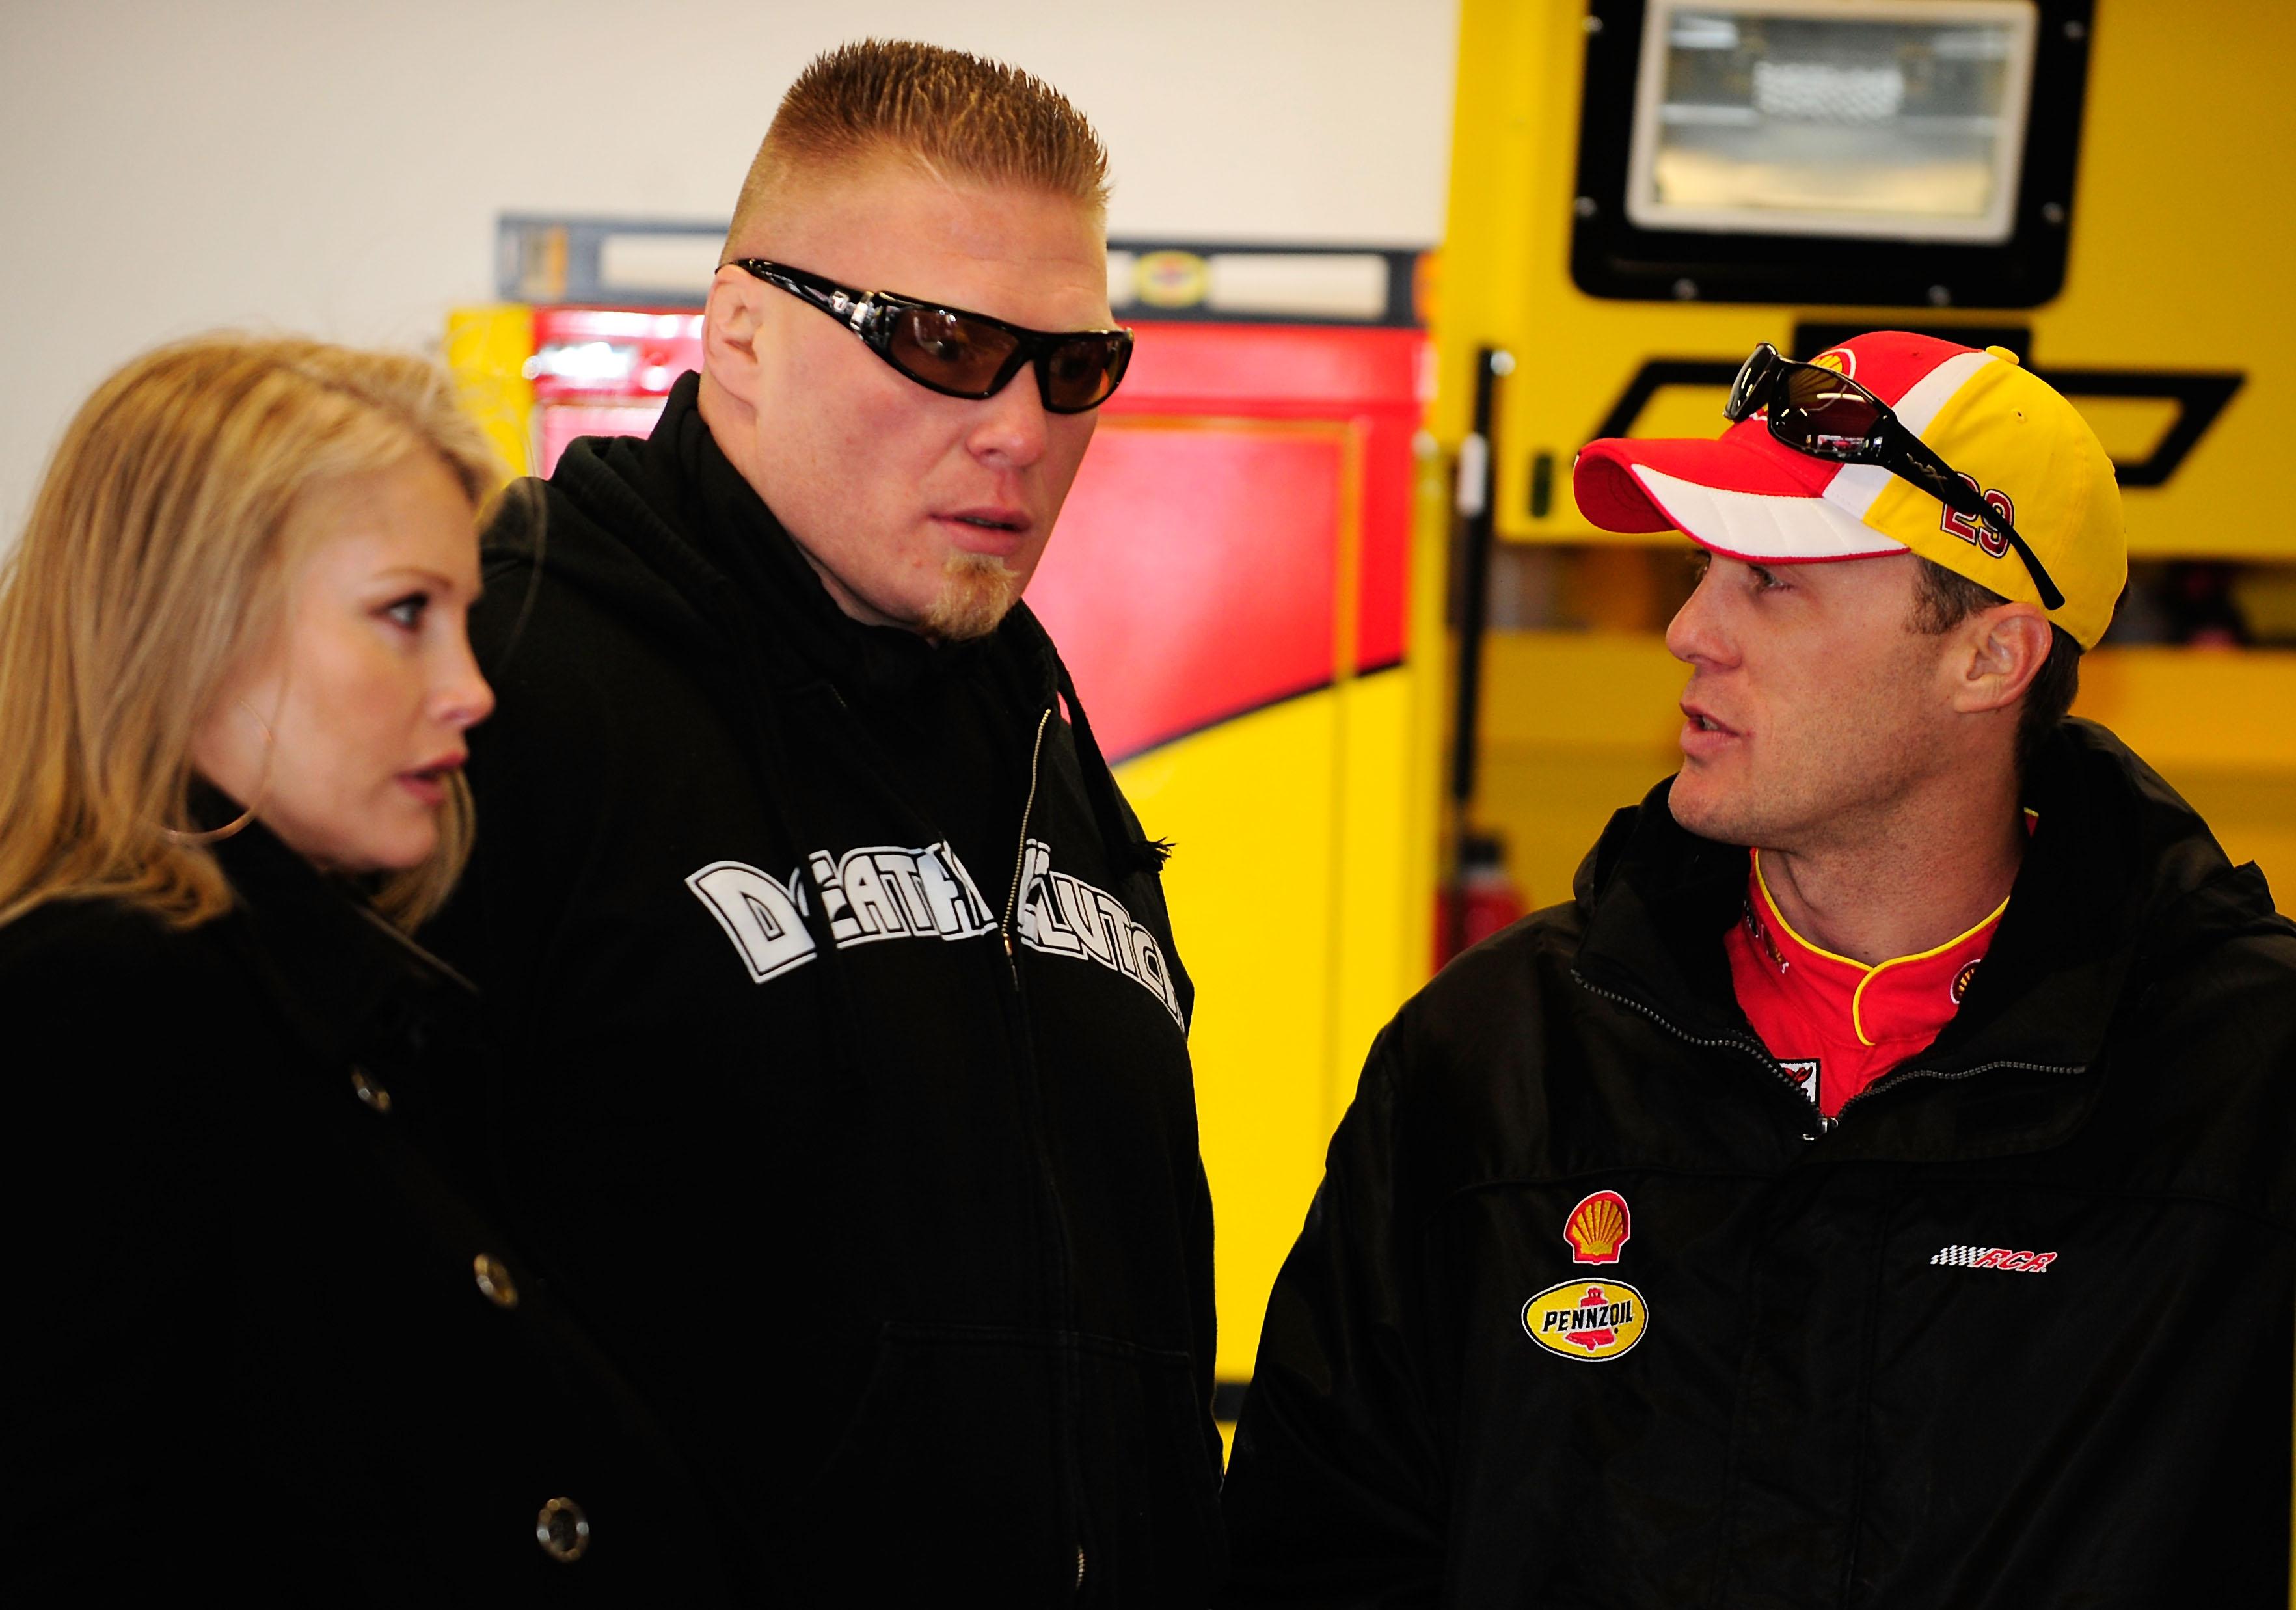 DAYTONA BEACH, FL - FEBRUARY 13:  MMA fighter Brock Lesnar(C)  speaks with Kevin Harvick(R), driver of the #29 Shell/Pennzoil Chevrolet, during practice for the Daytona 500 at Daytona International Speedway on February 13, 2010 in Daytona Beach, Florida.